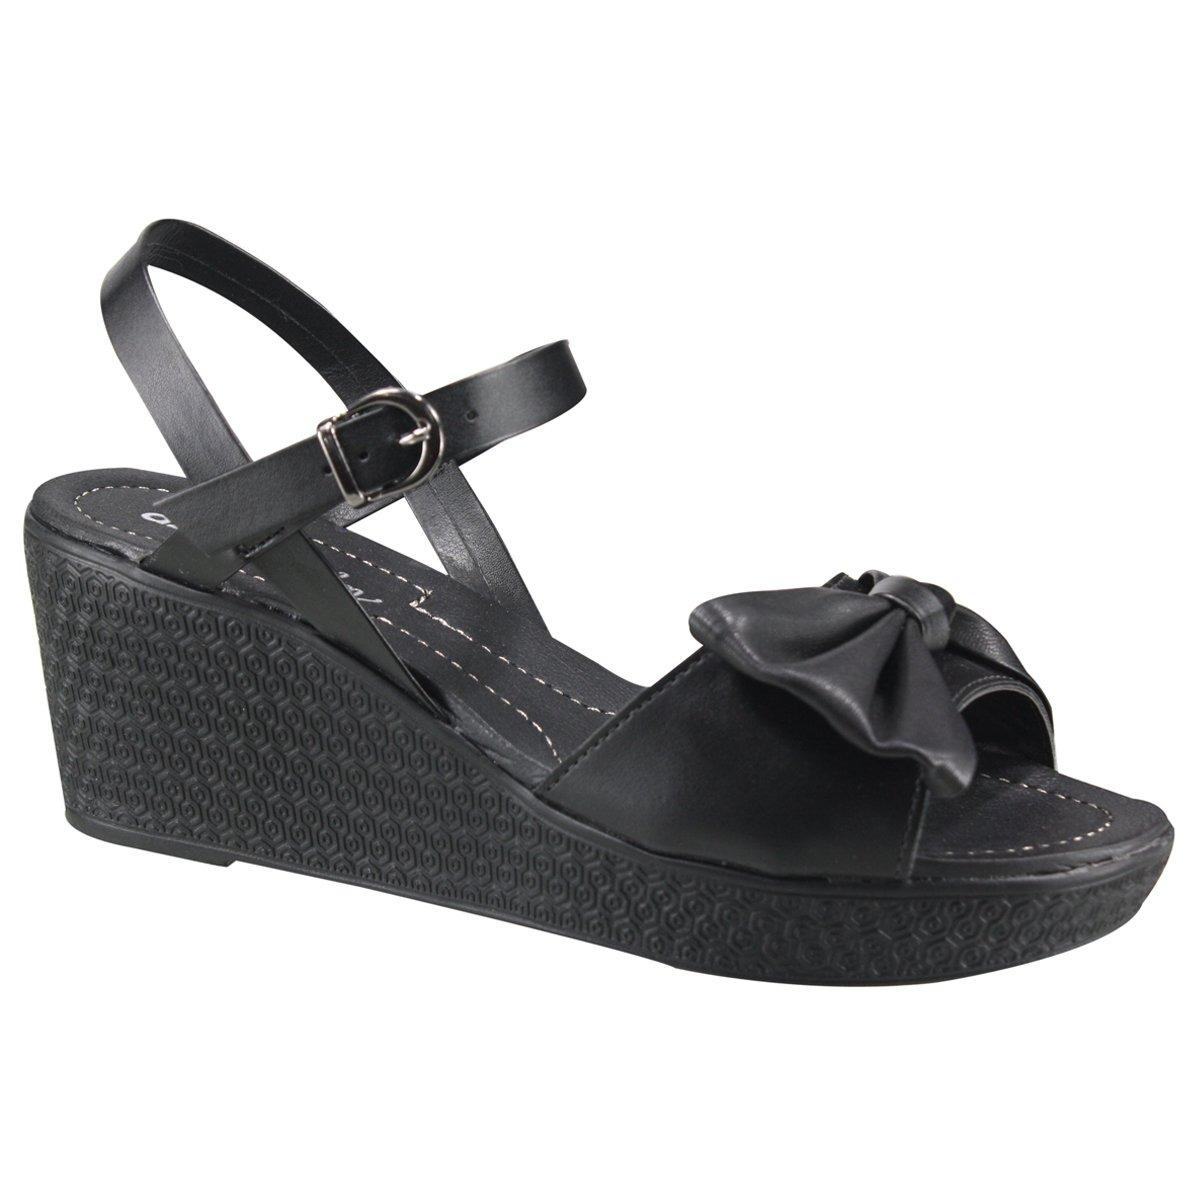 d5cf14eea sandália feminina anabela azaleia 496/909 | katy calçados. Carregando zoom.